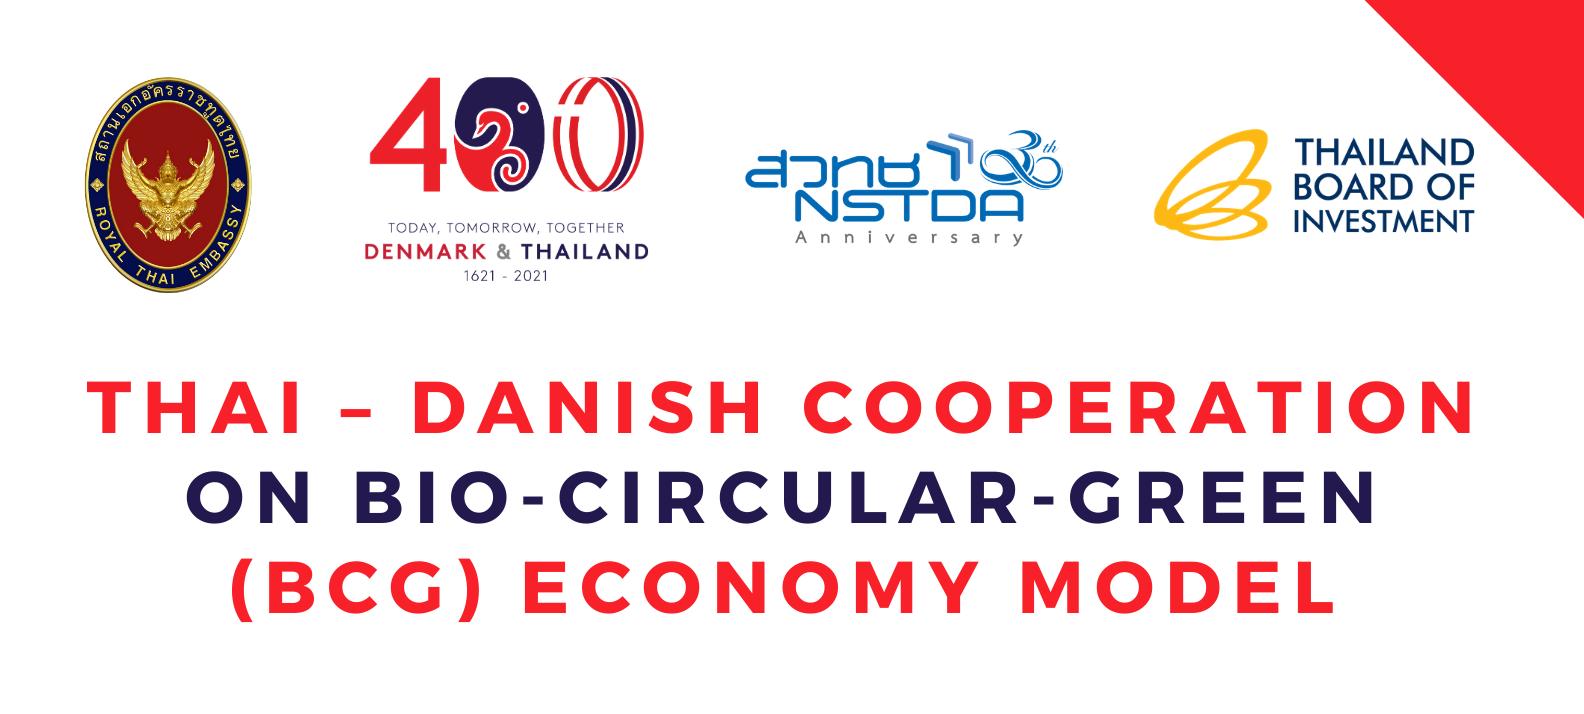 You are currently viewing สัมมนาออนไลน์ Thai-Danish Cooperation on Bio-Circular-Green Economy Model